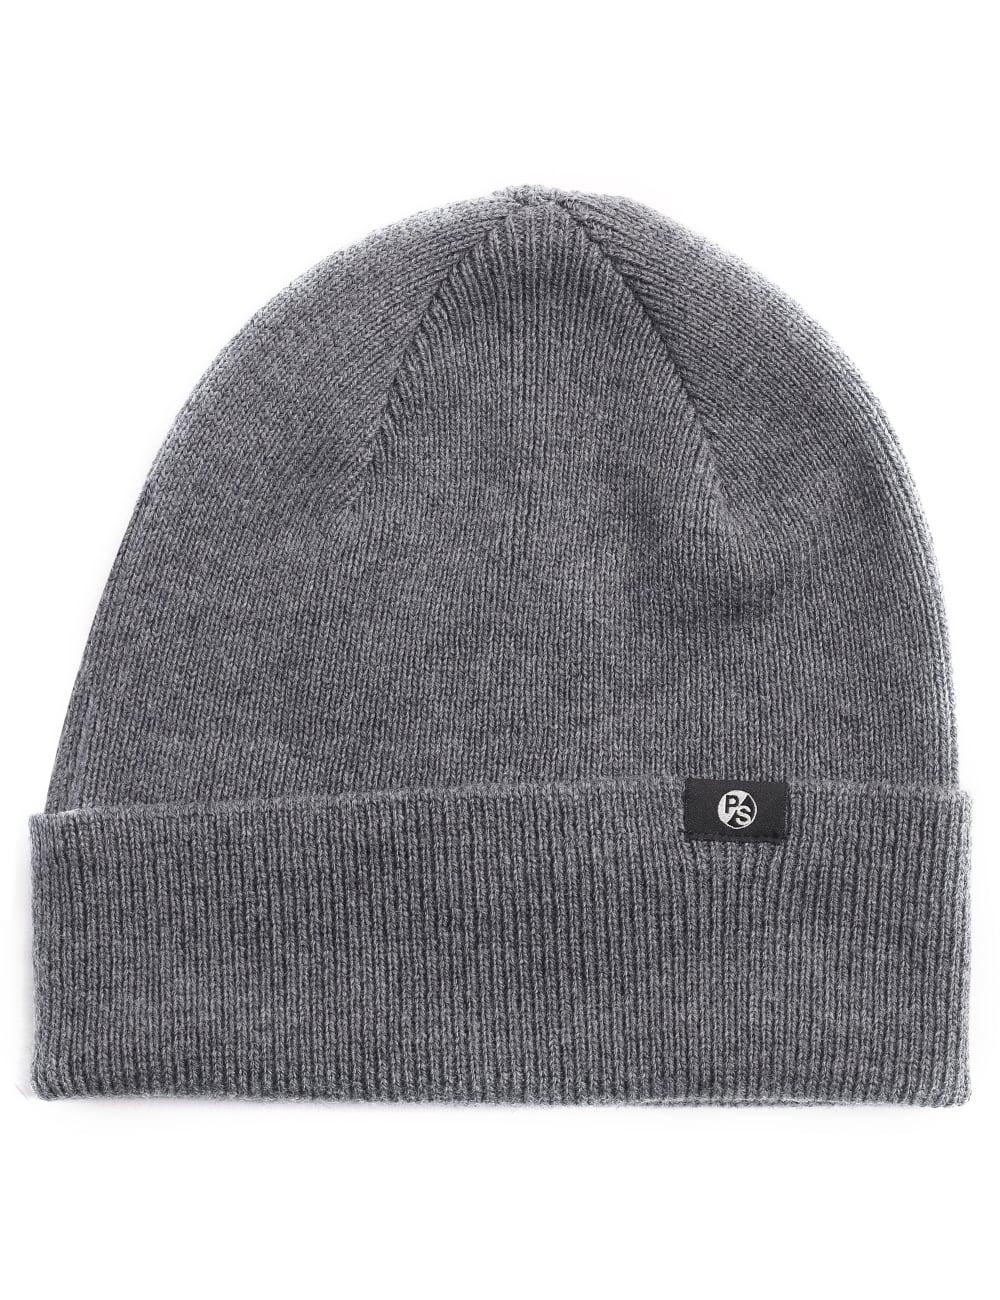 552f948b757 Paul Smith Men s Beanie Hat